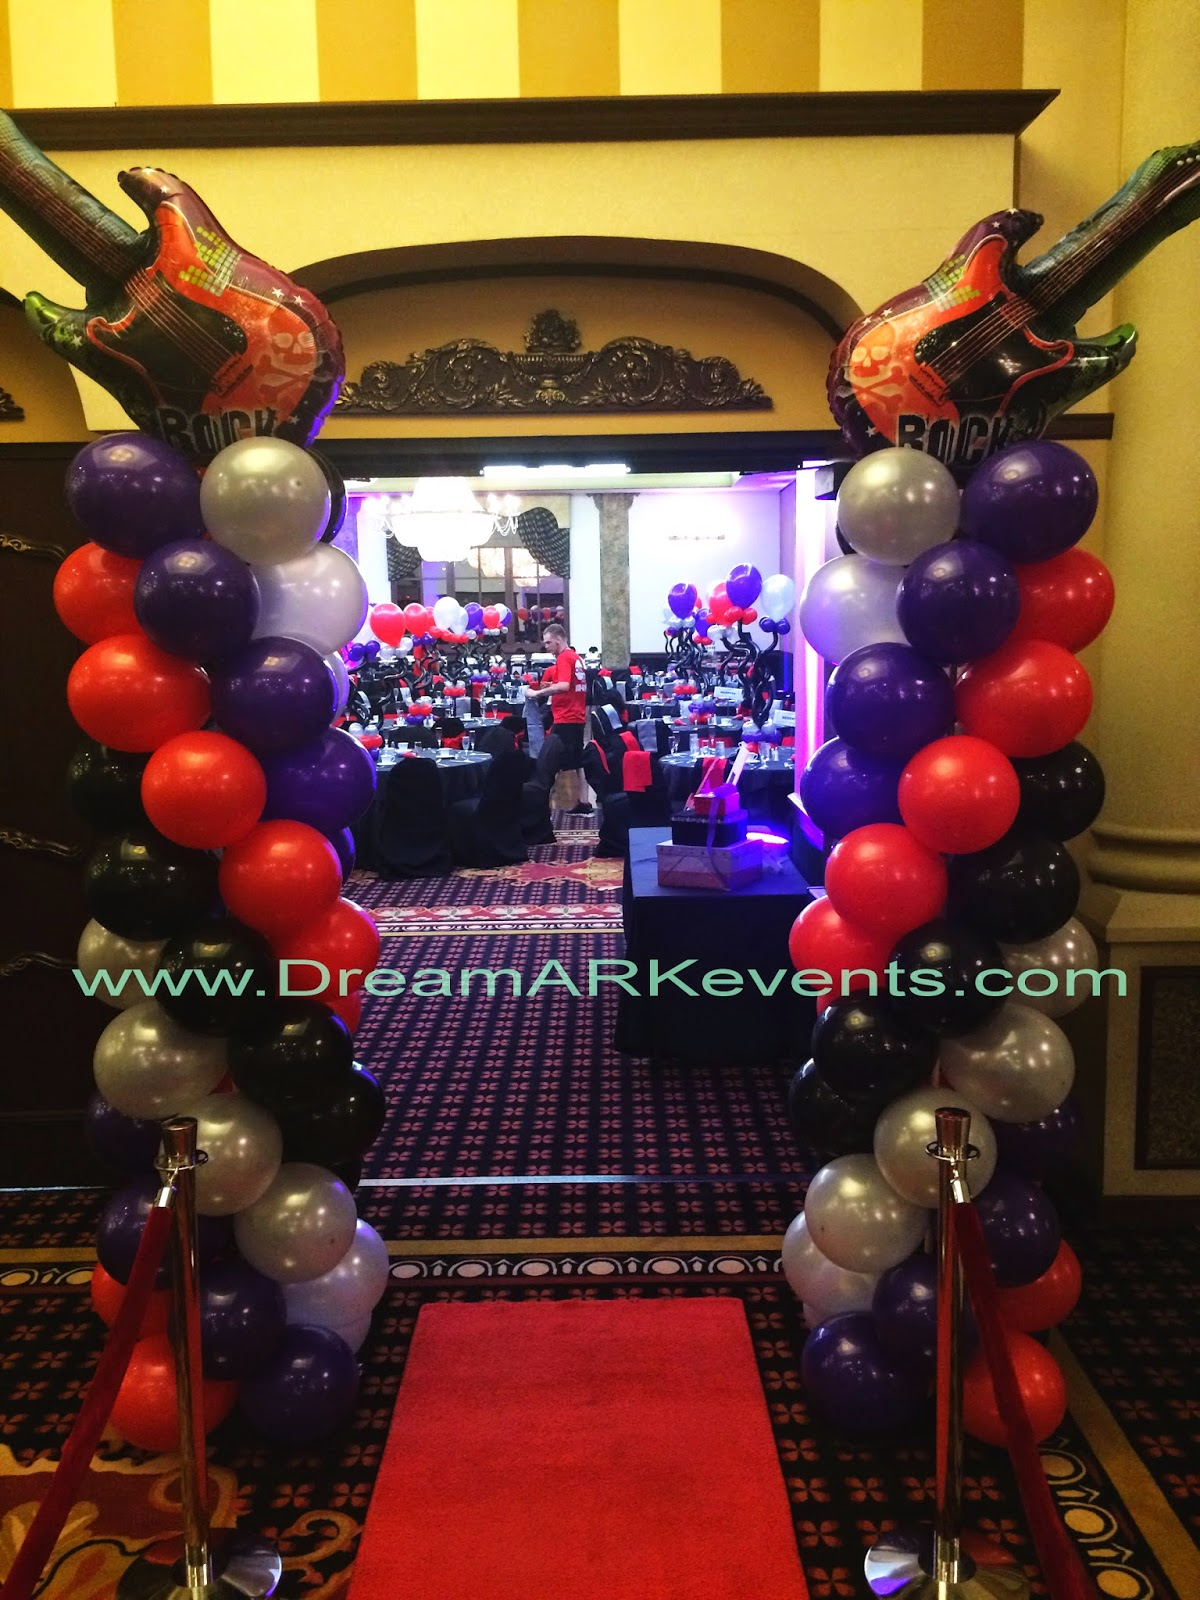 Balloon Column Party Decoration With Balloons